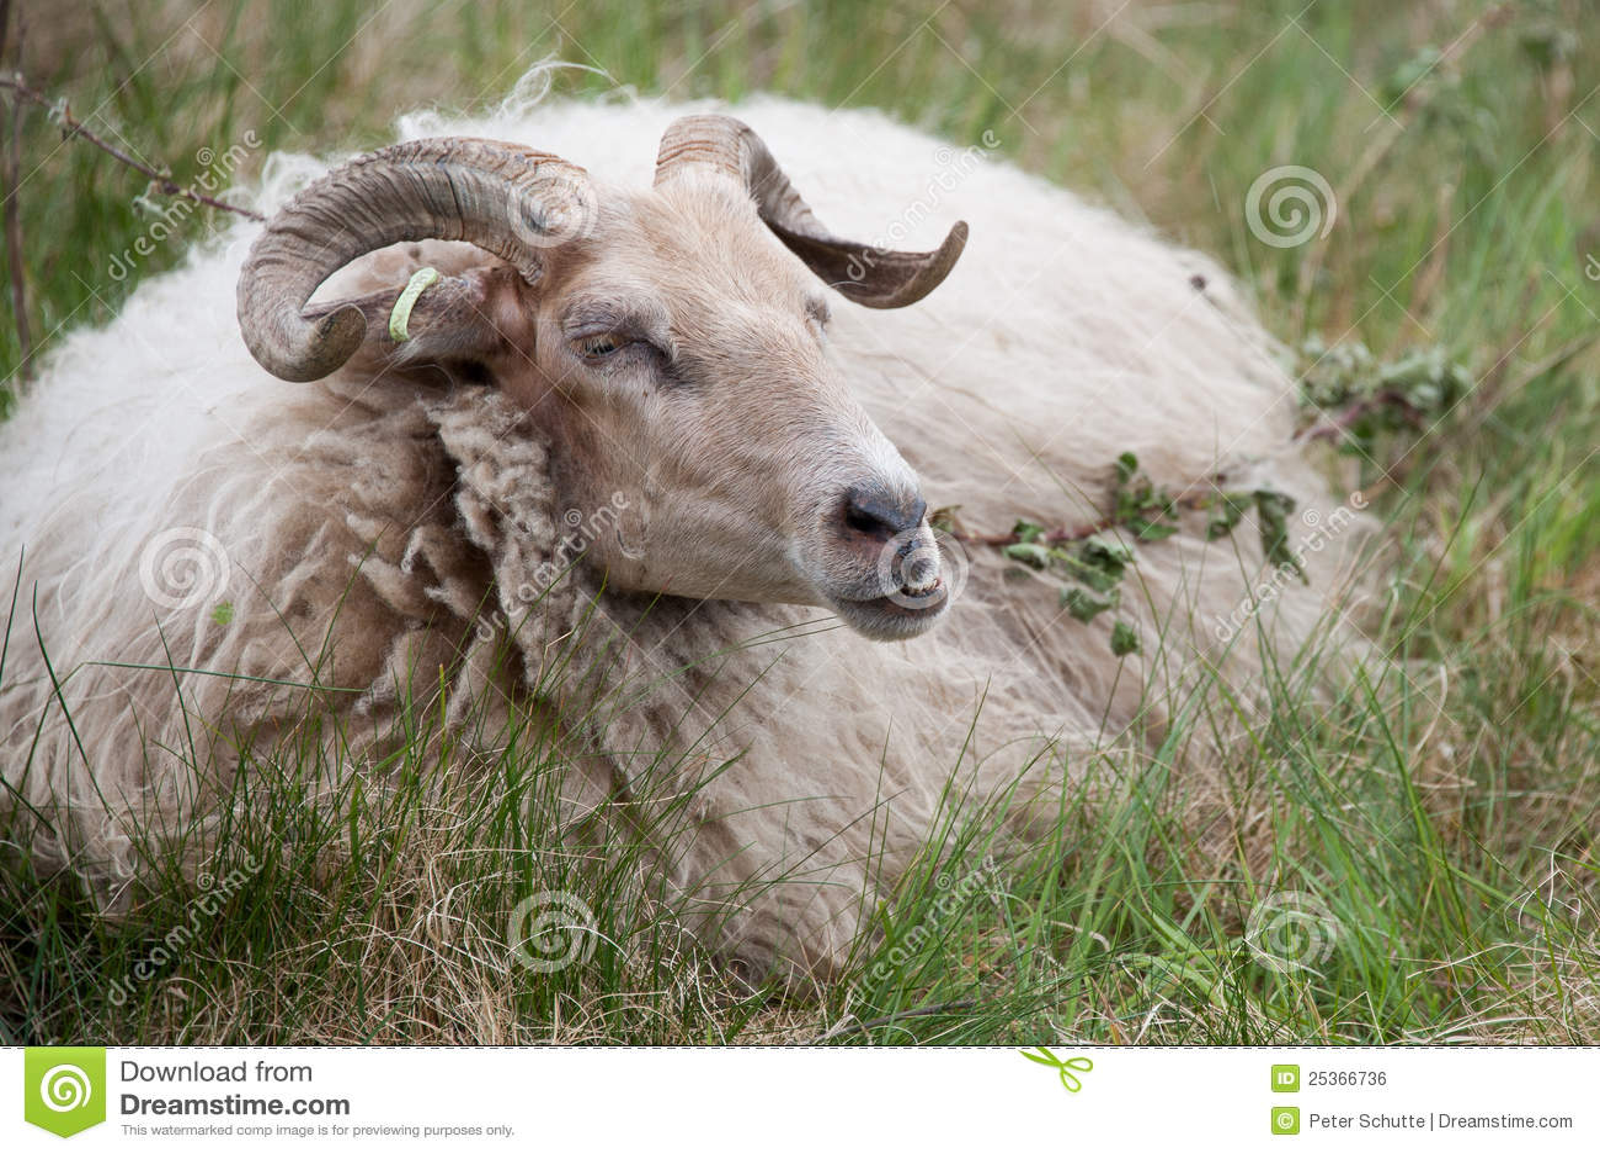 Male Sheep Royalty Free Stock Image - Image: 25366736